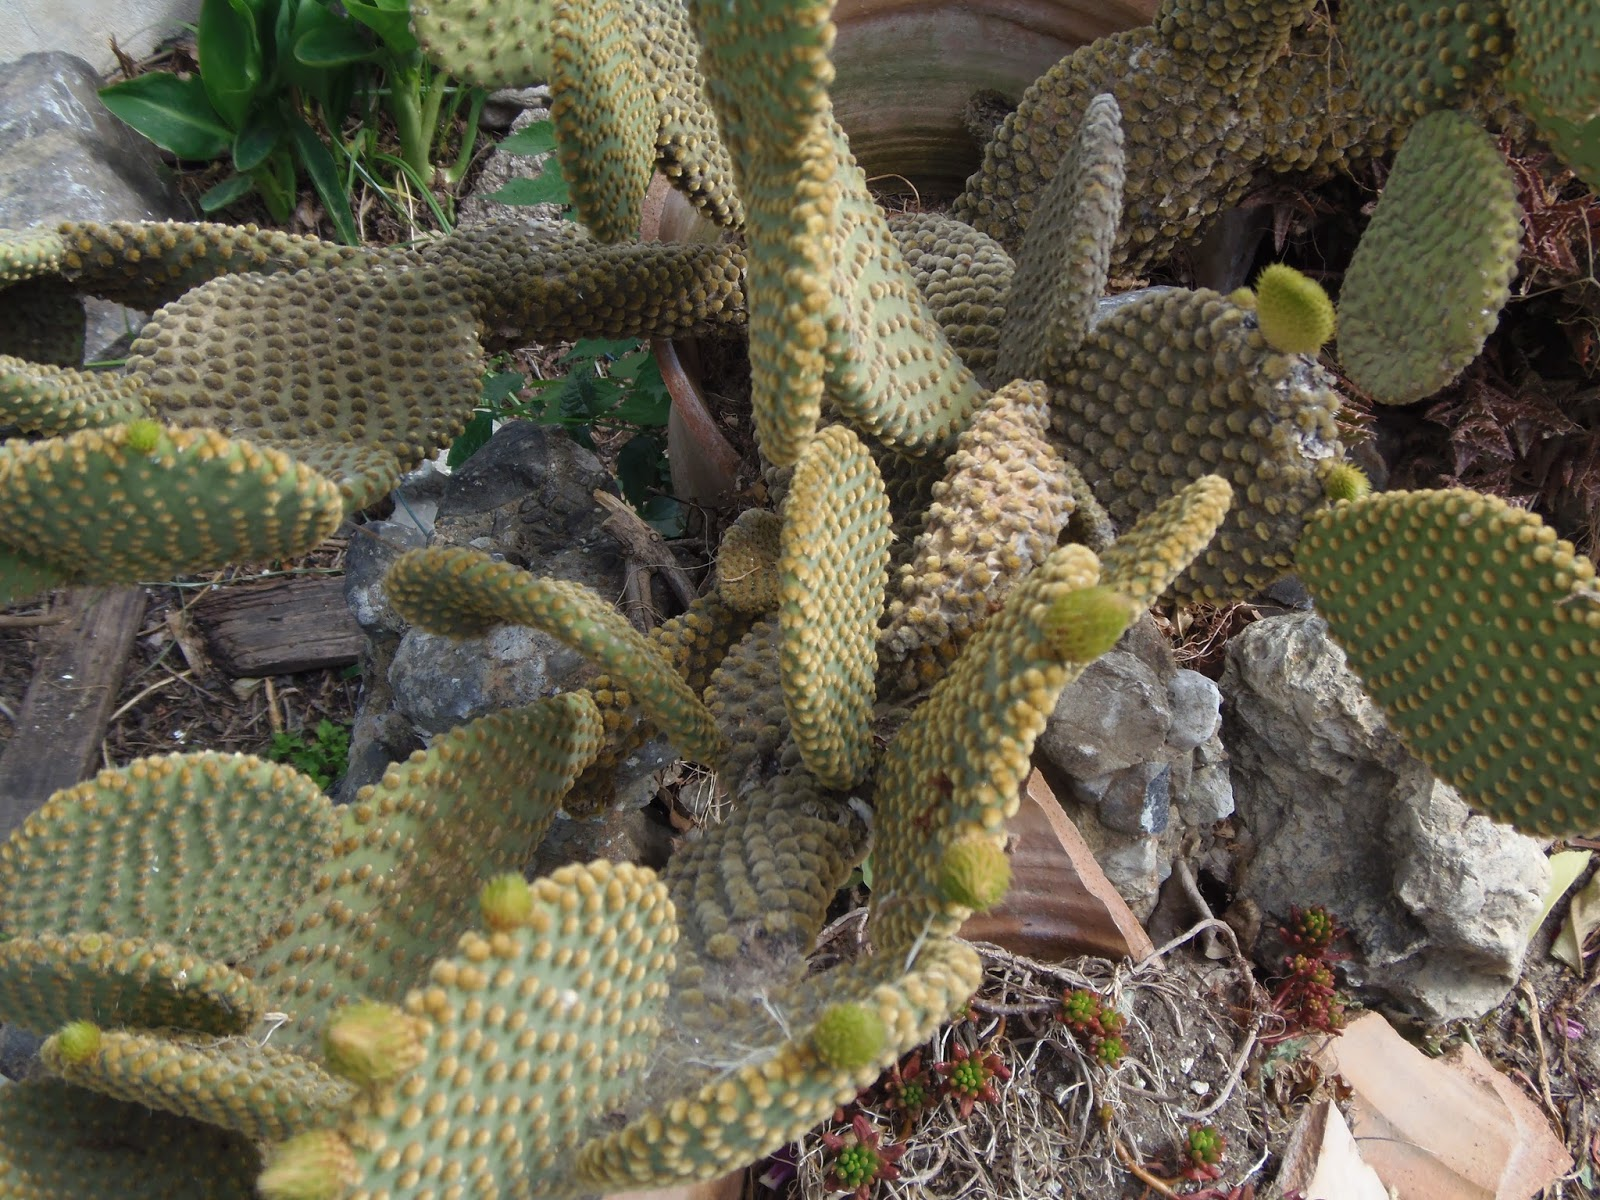 cactus, cacti, plant, travel, traveling, adventure, greece, crete, greek, island, jeep safari